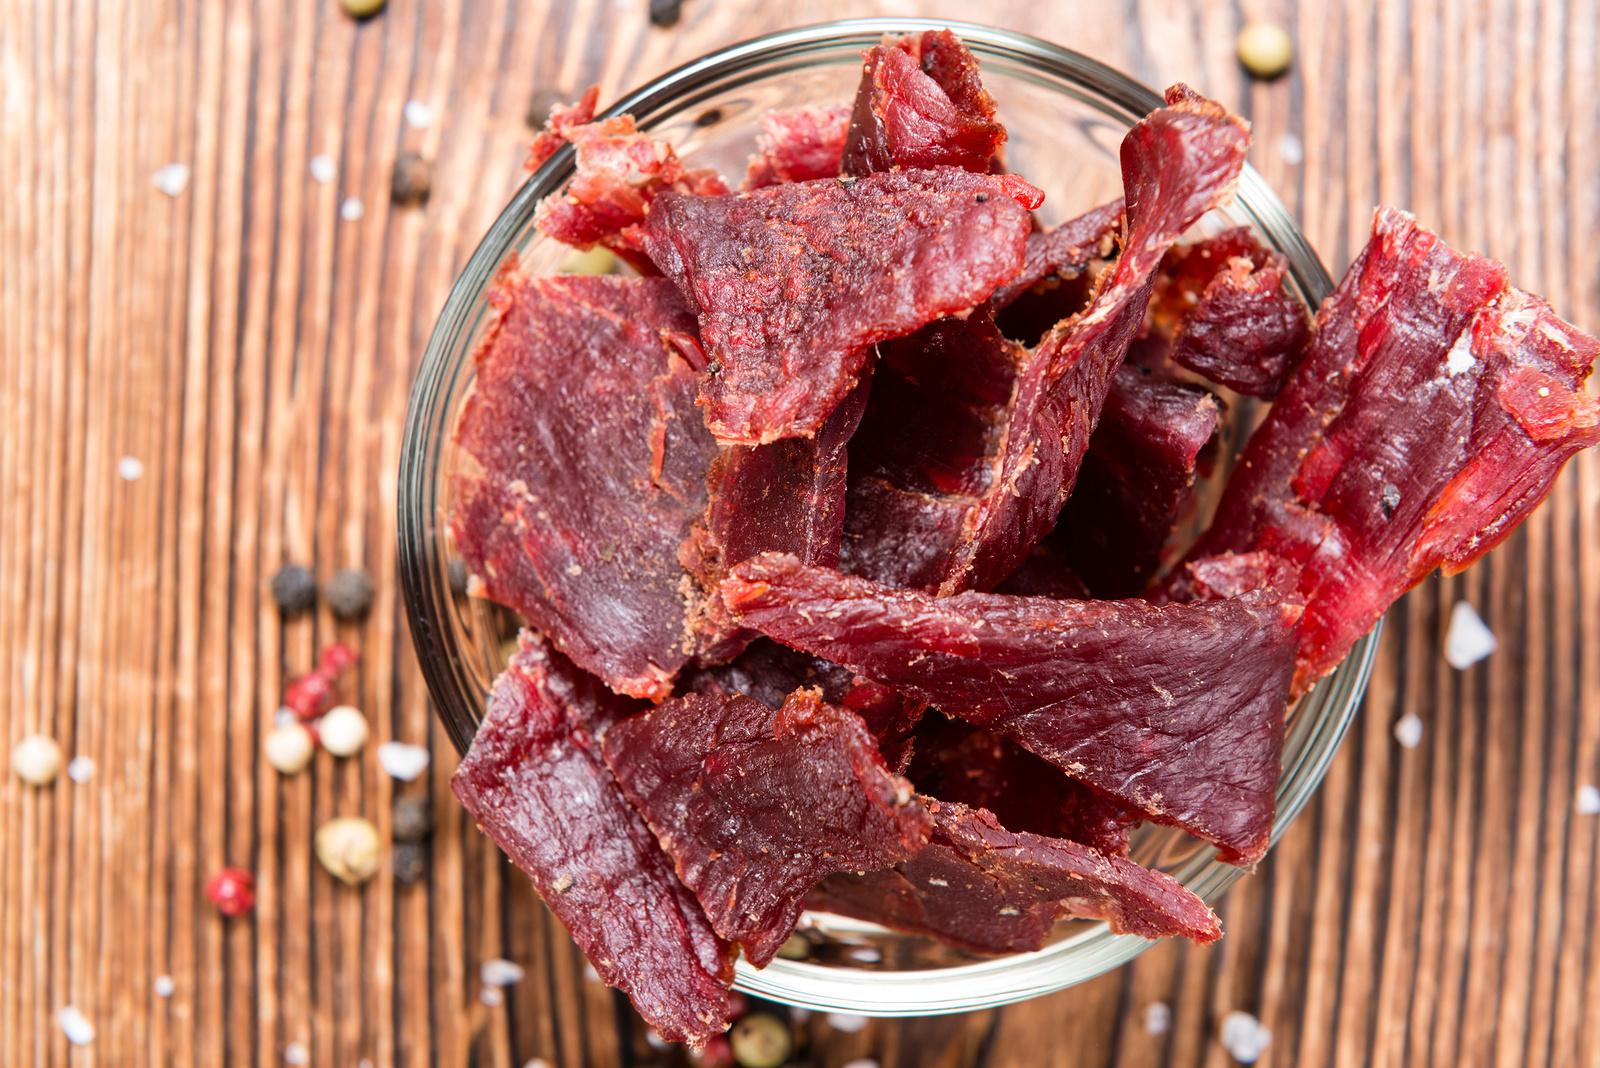 Homemade beef jerky gift idea | The Dating Divas